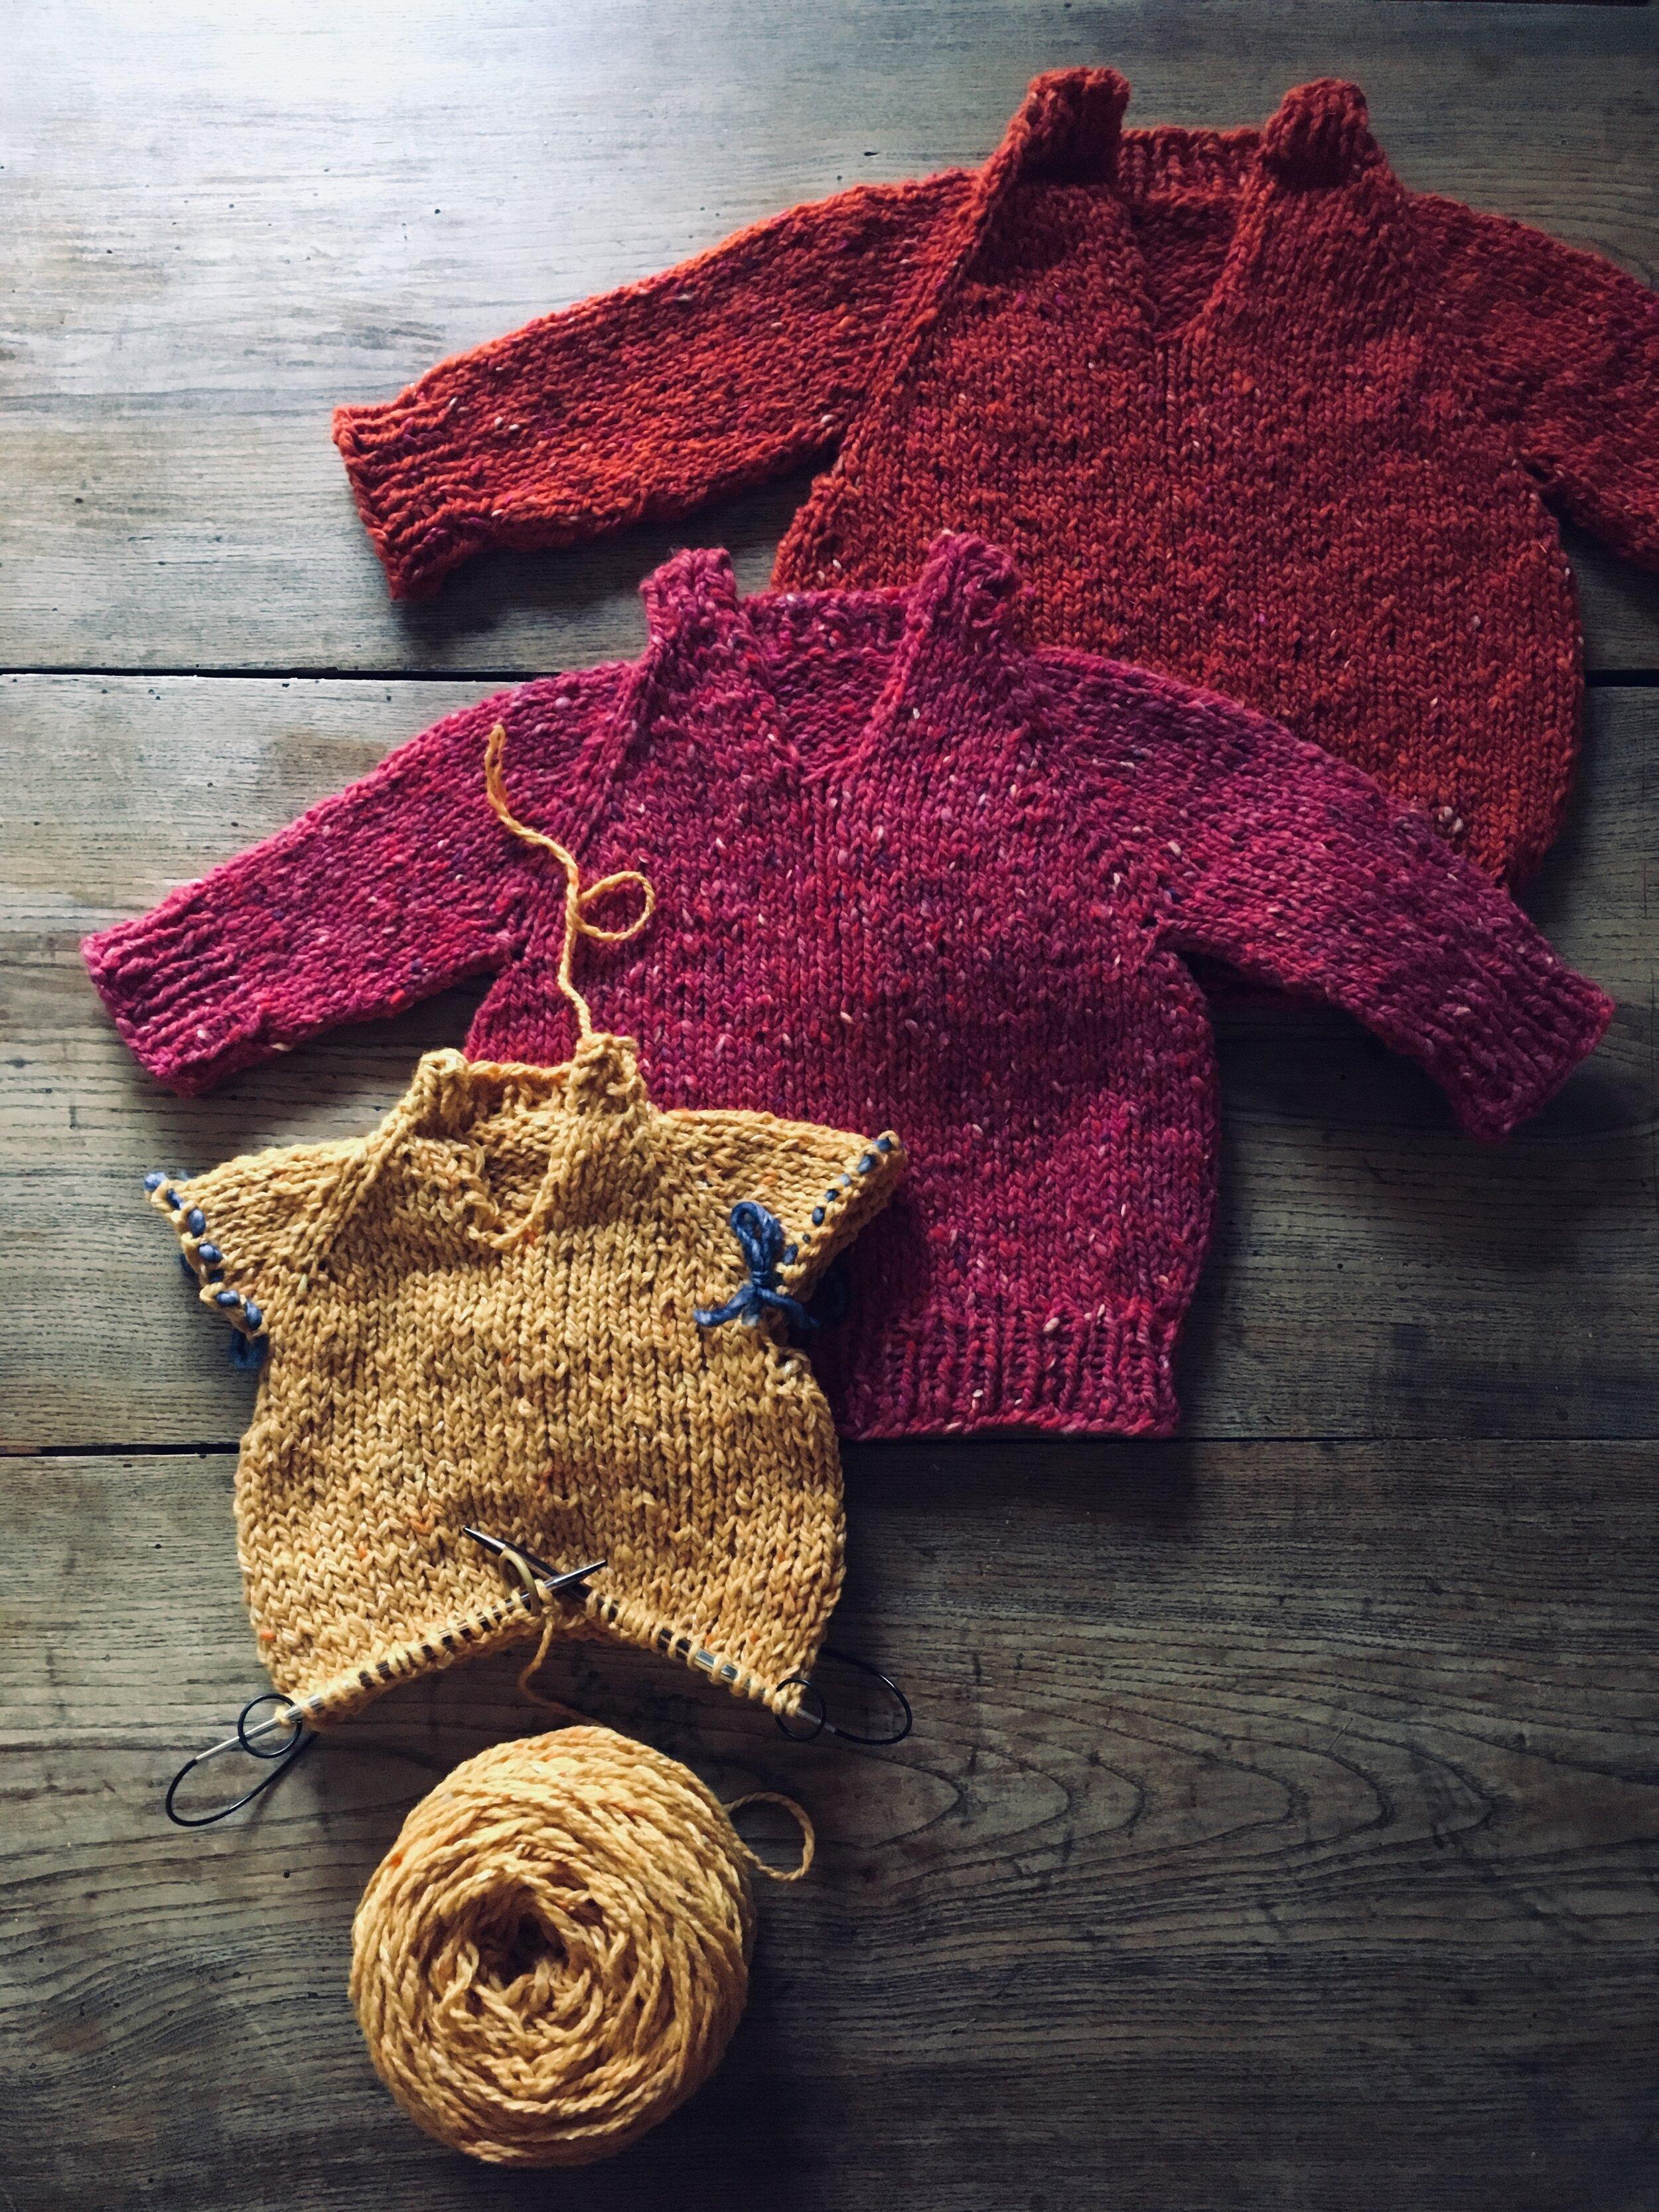 wool_done_knitting_retreat_mas_del_saro_vaikea_sweater_3.jpg